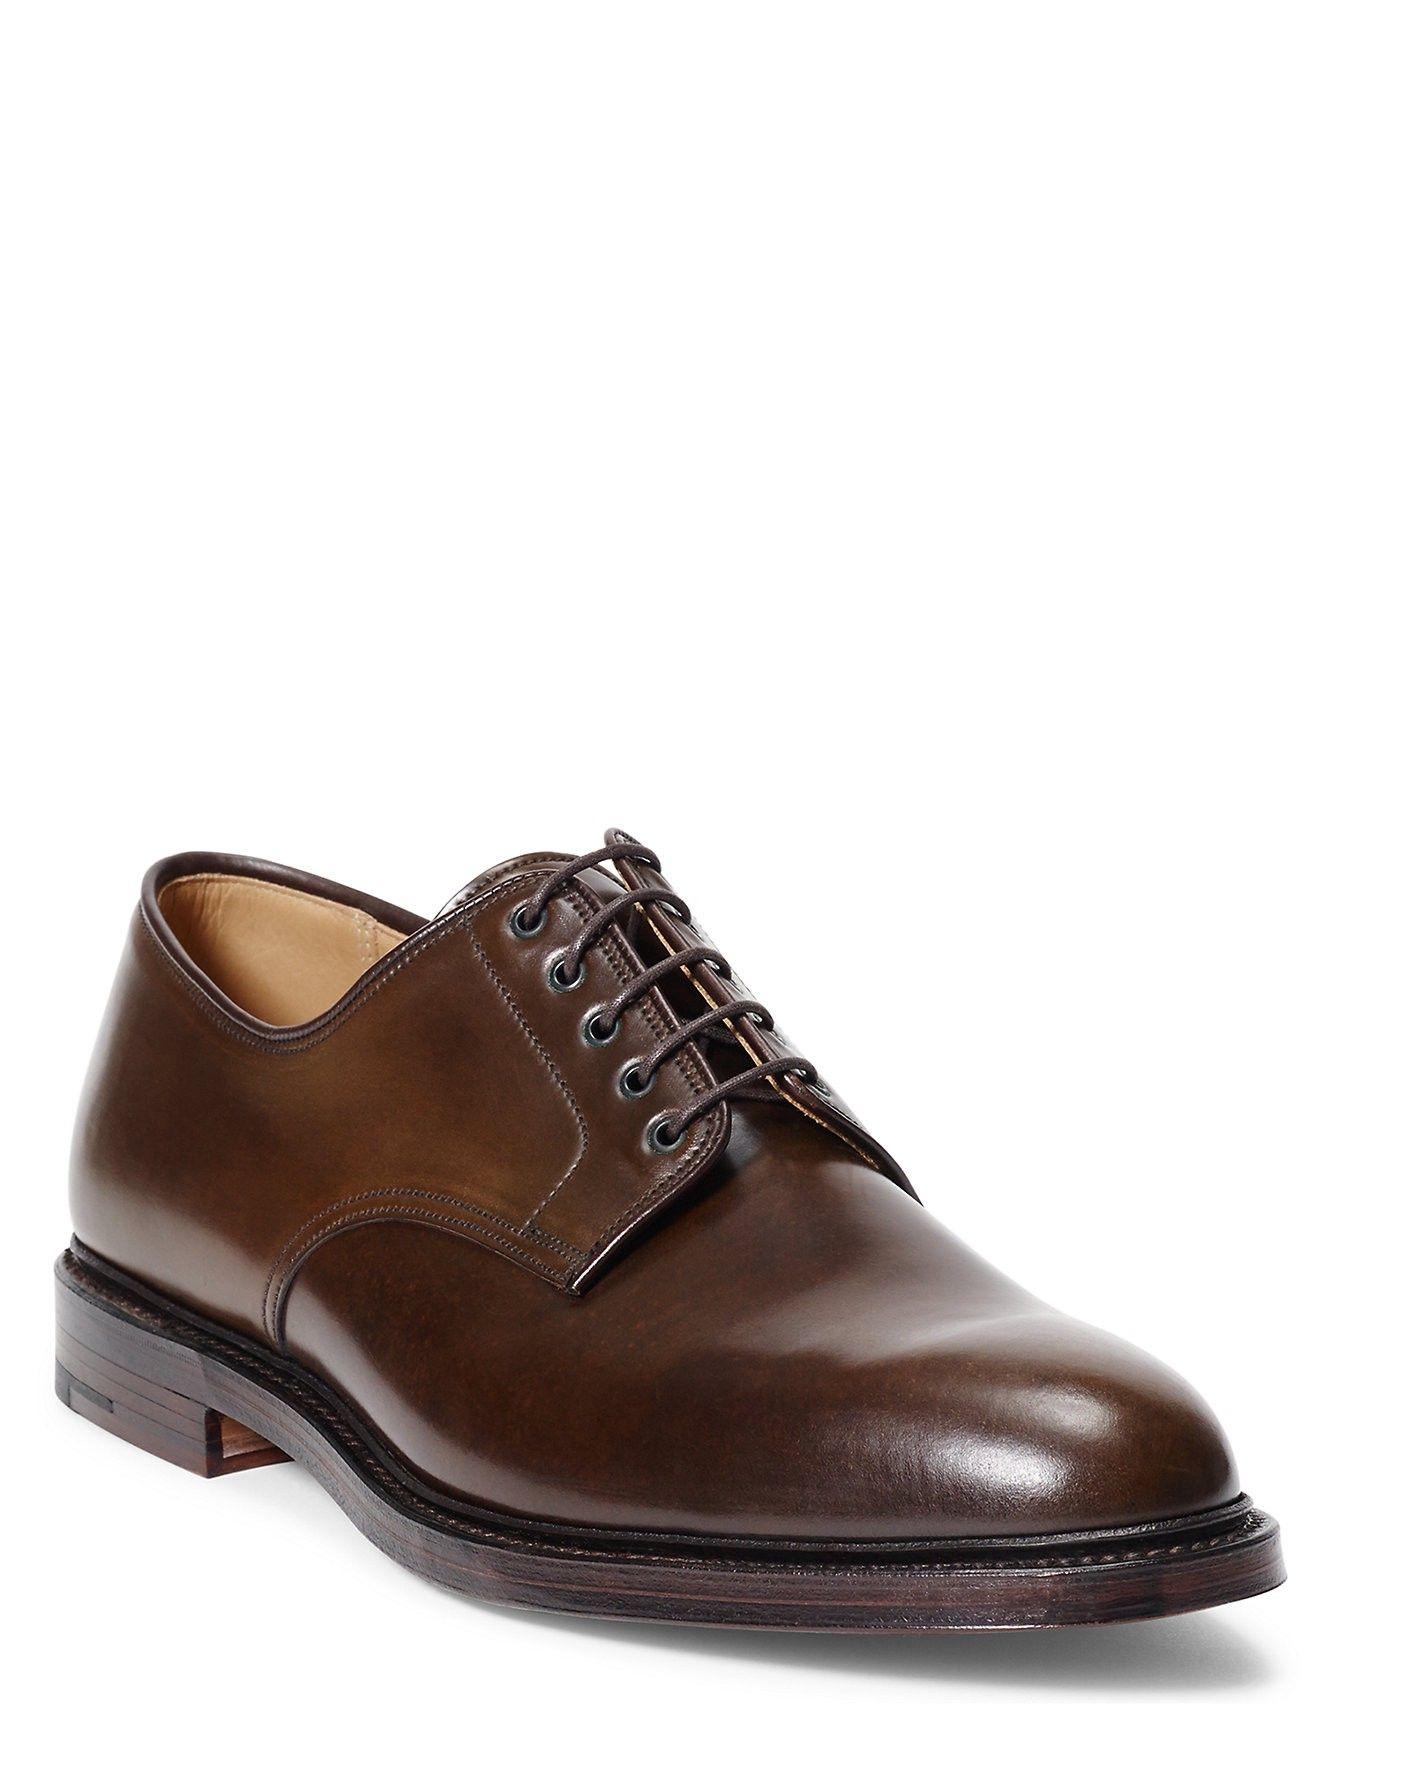 d77ecd2cb67 RALPH LAUREN Ralph Lauren Marlow Cordovan Blucher Shoe.  ralphlauren  shoes